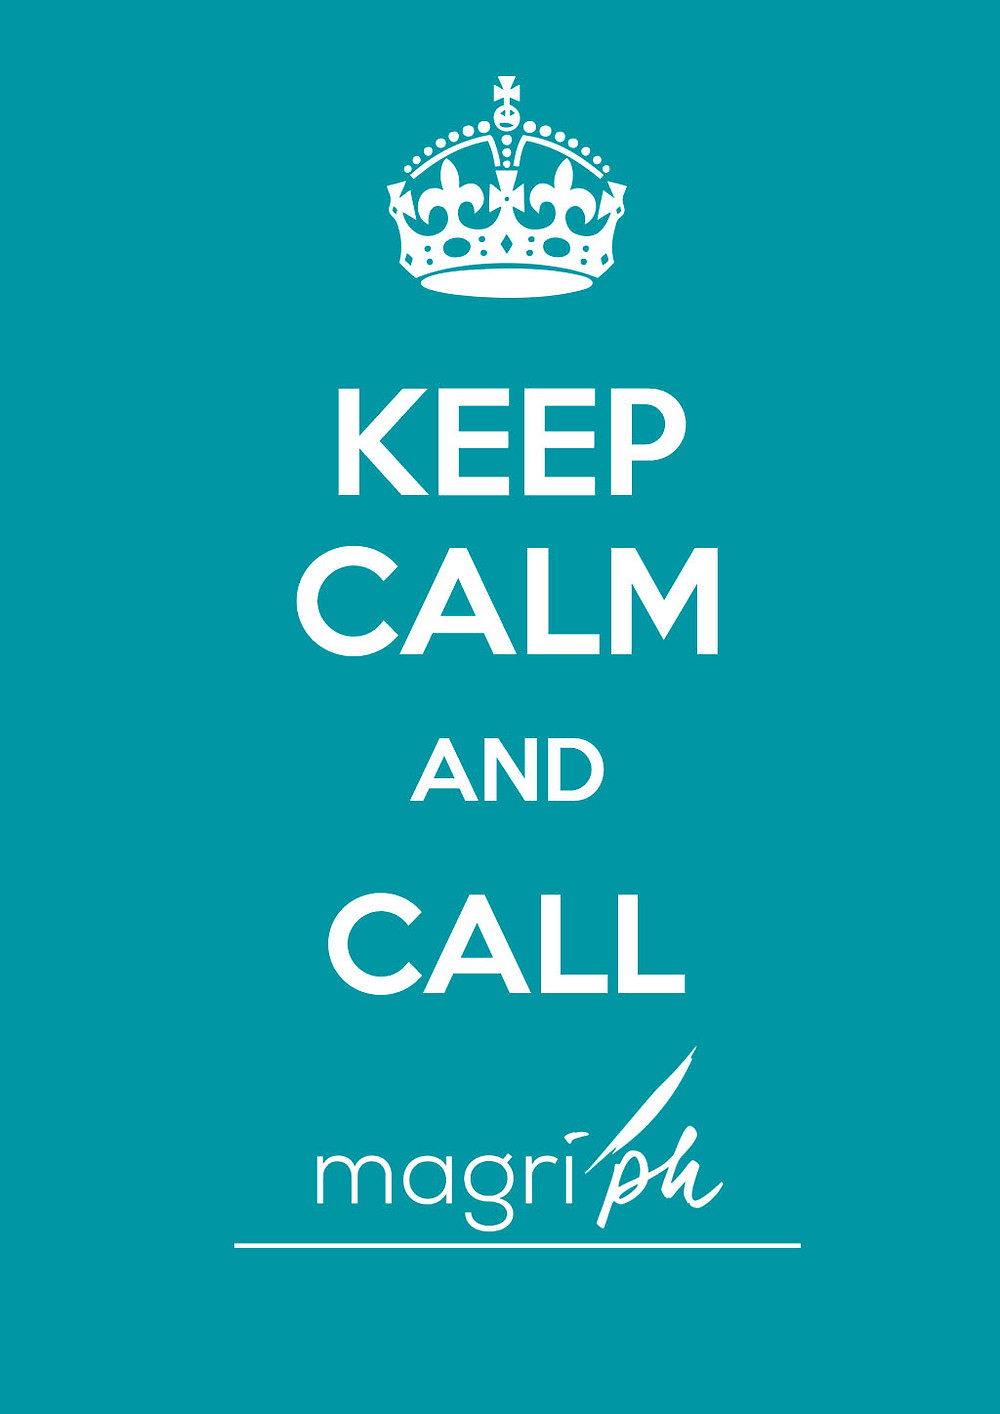 keep_calm_and call magriph.jpg